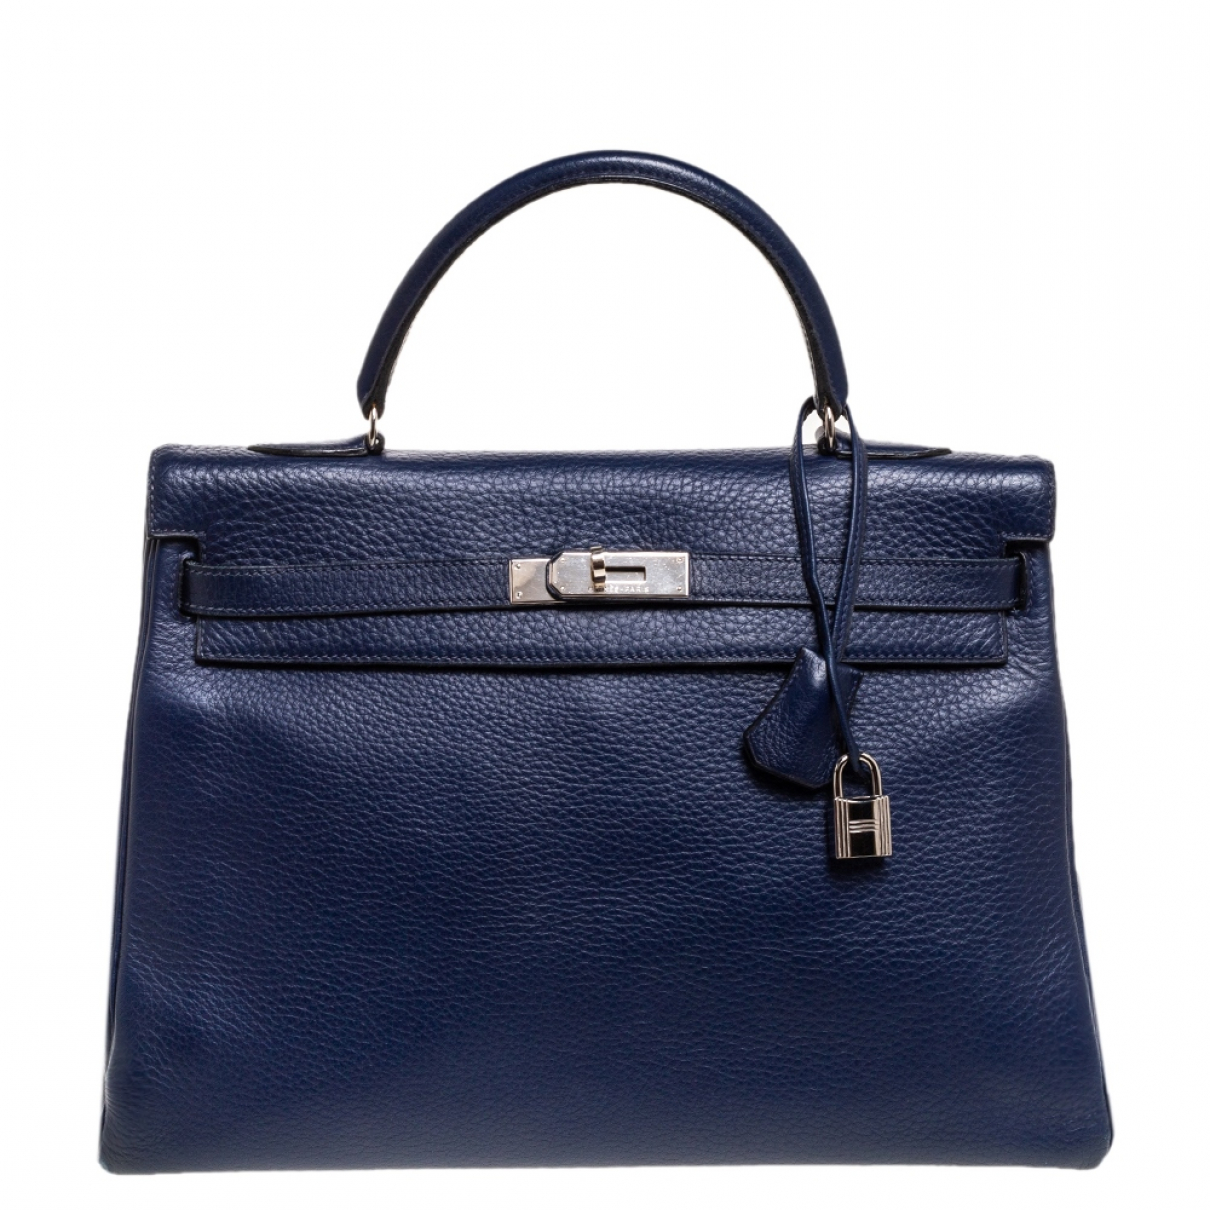 Hermès Kelly 35 Blue Leather handbag for Women N